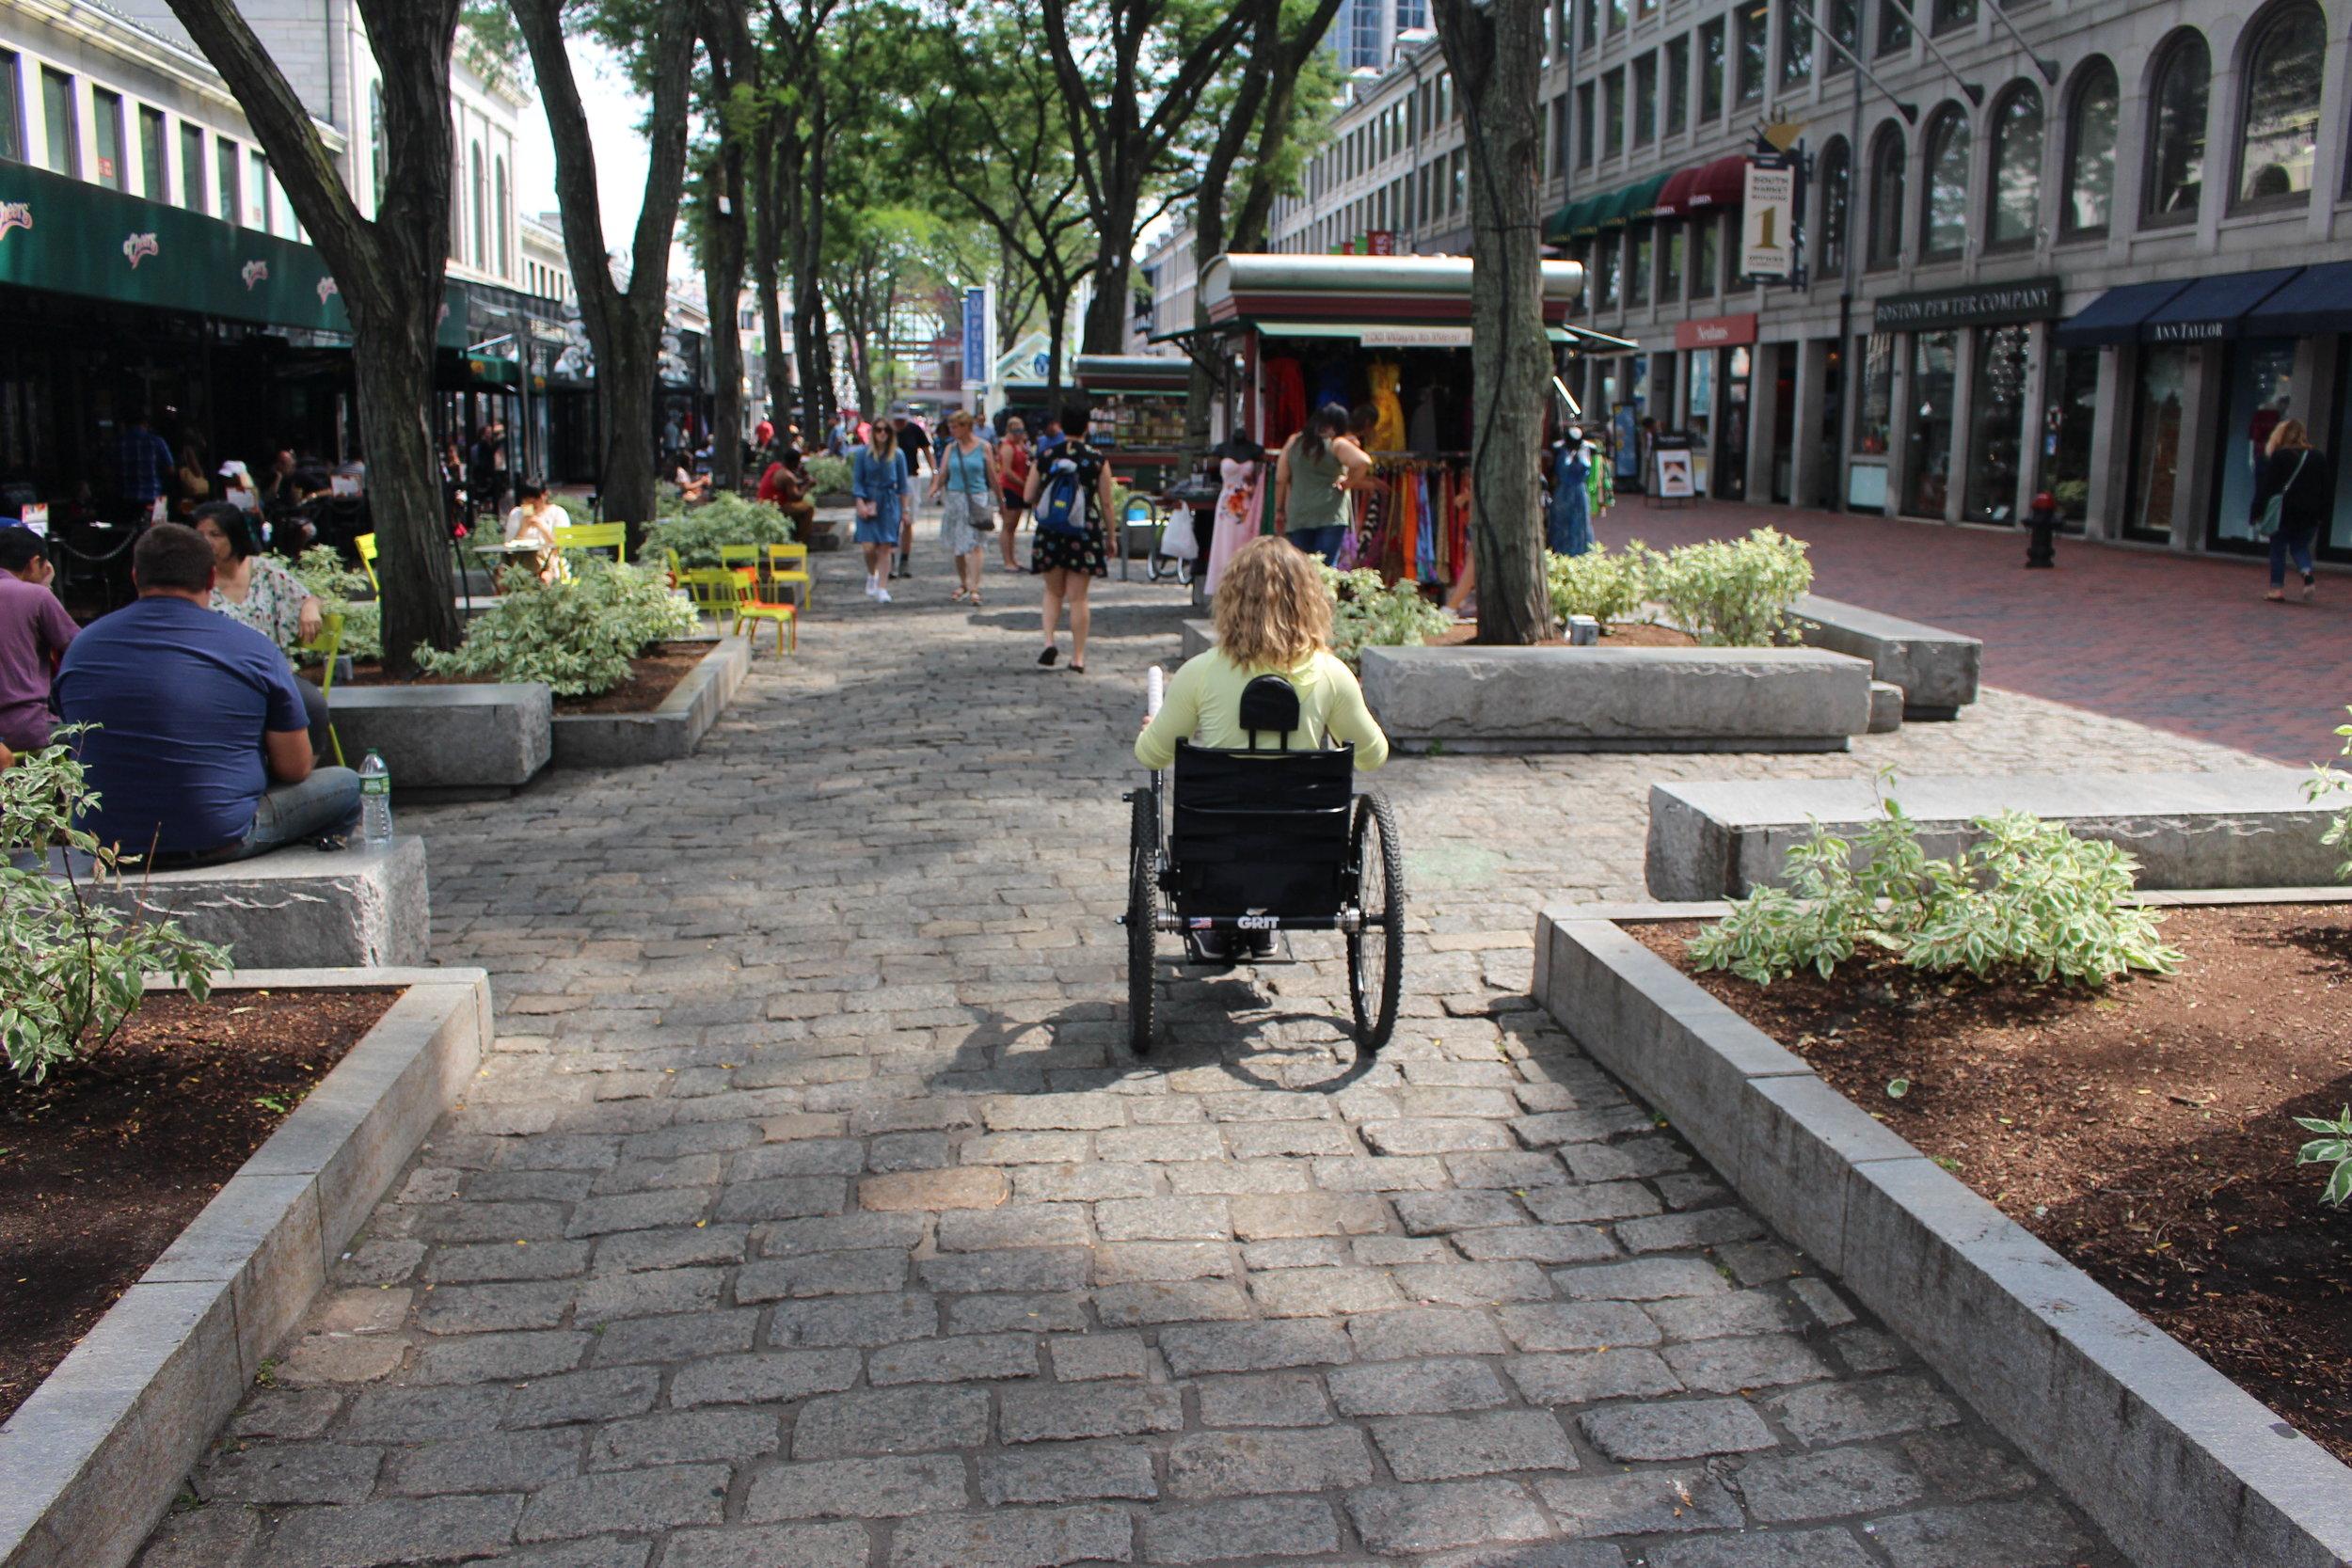 Traversing the cobblestones near Quincy Market.